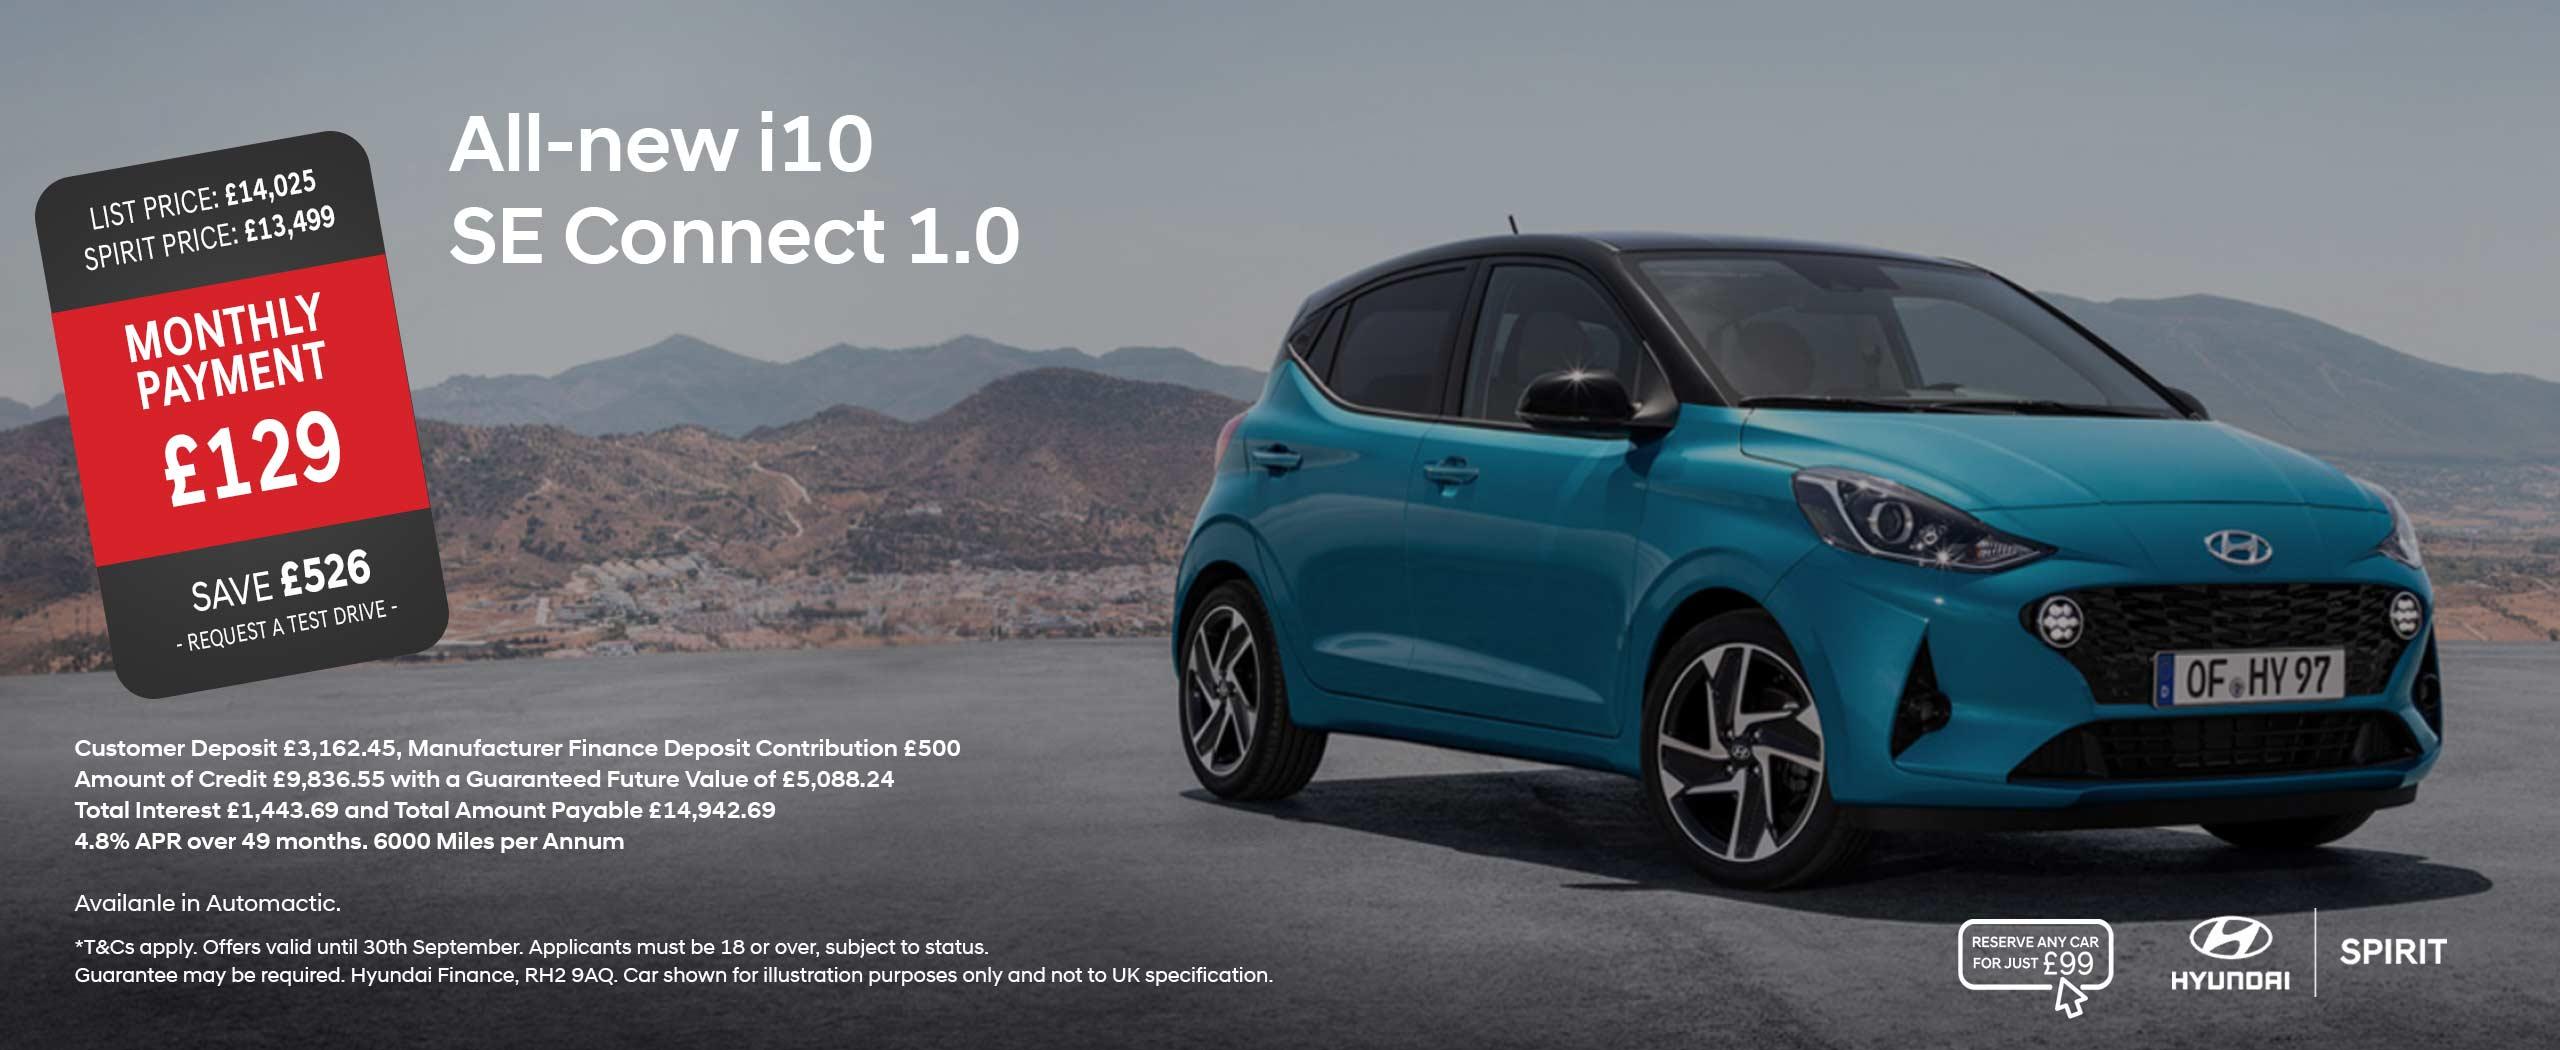 All-New i10